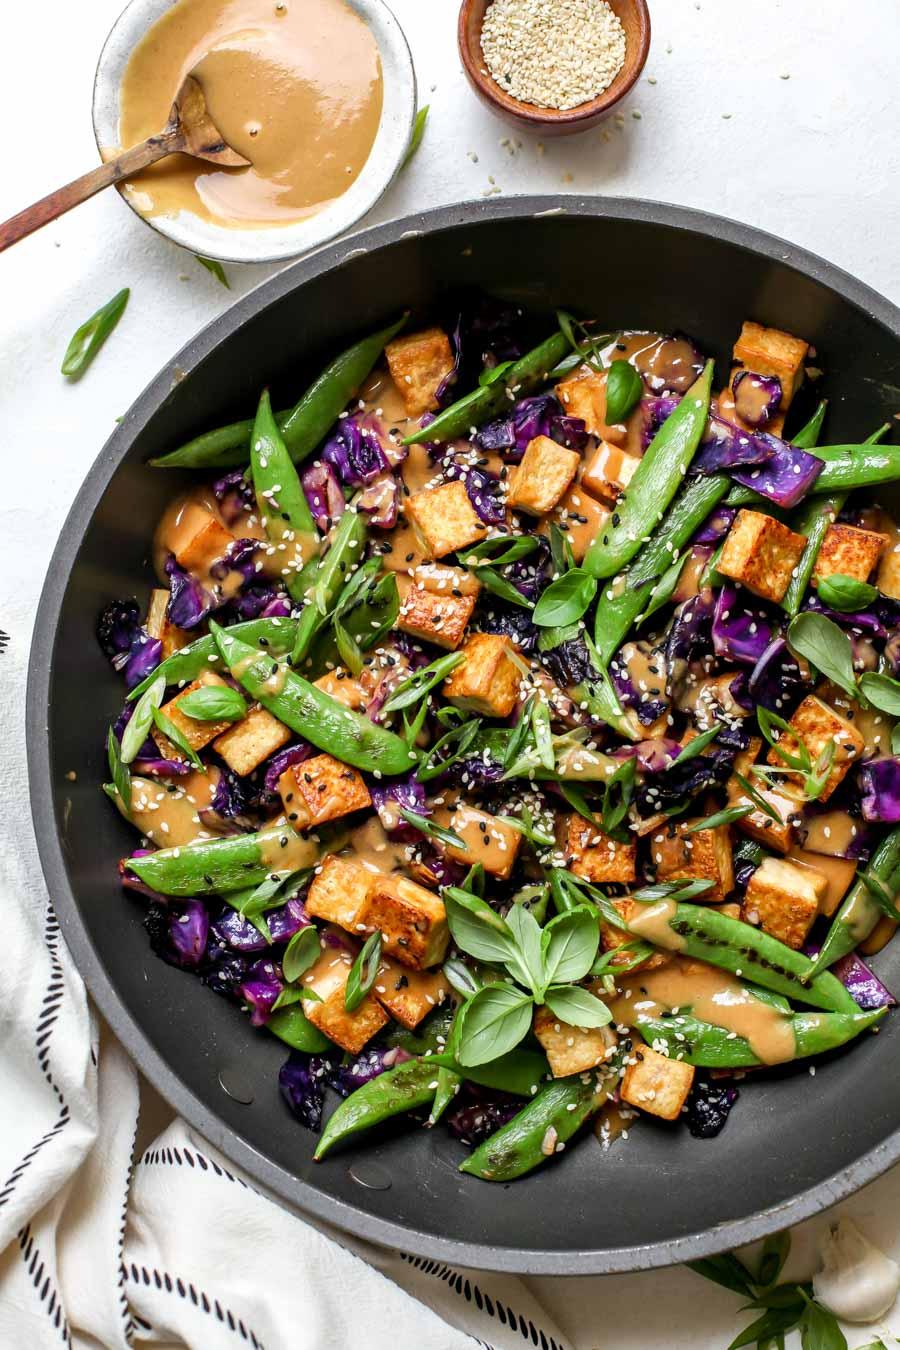 How to Make Vegetarian Stir-Fry